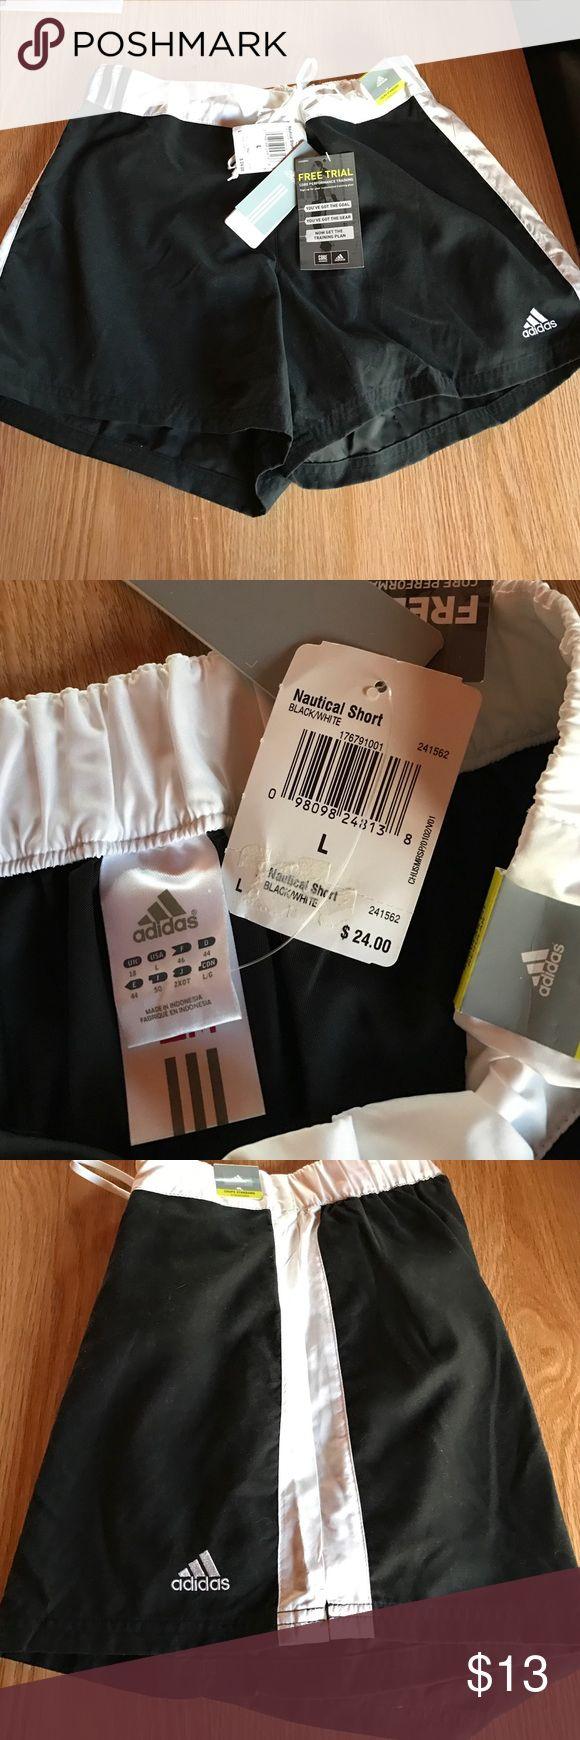 NWT Adidas Nautical Shorts Drawstring with back pocket. New. Adidas Shorts